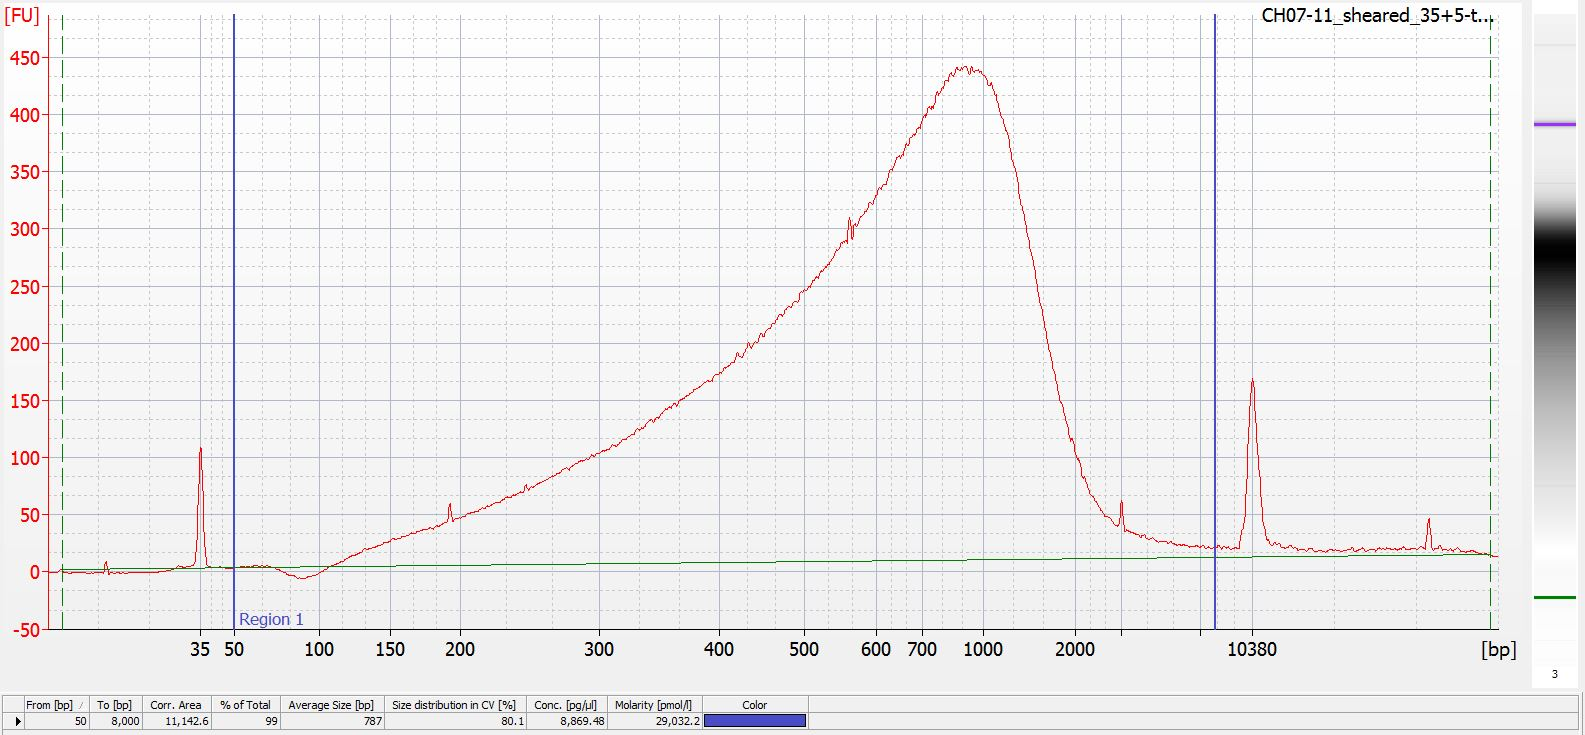 Sheared CH07-11 Bioanalyzer electropherogram